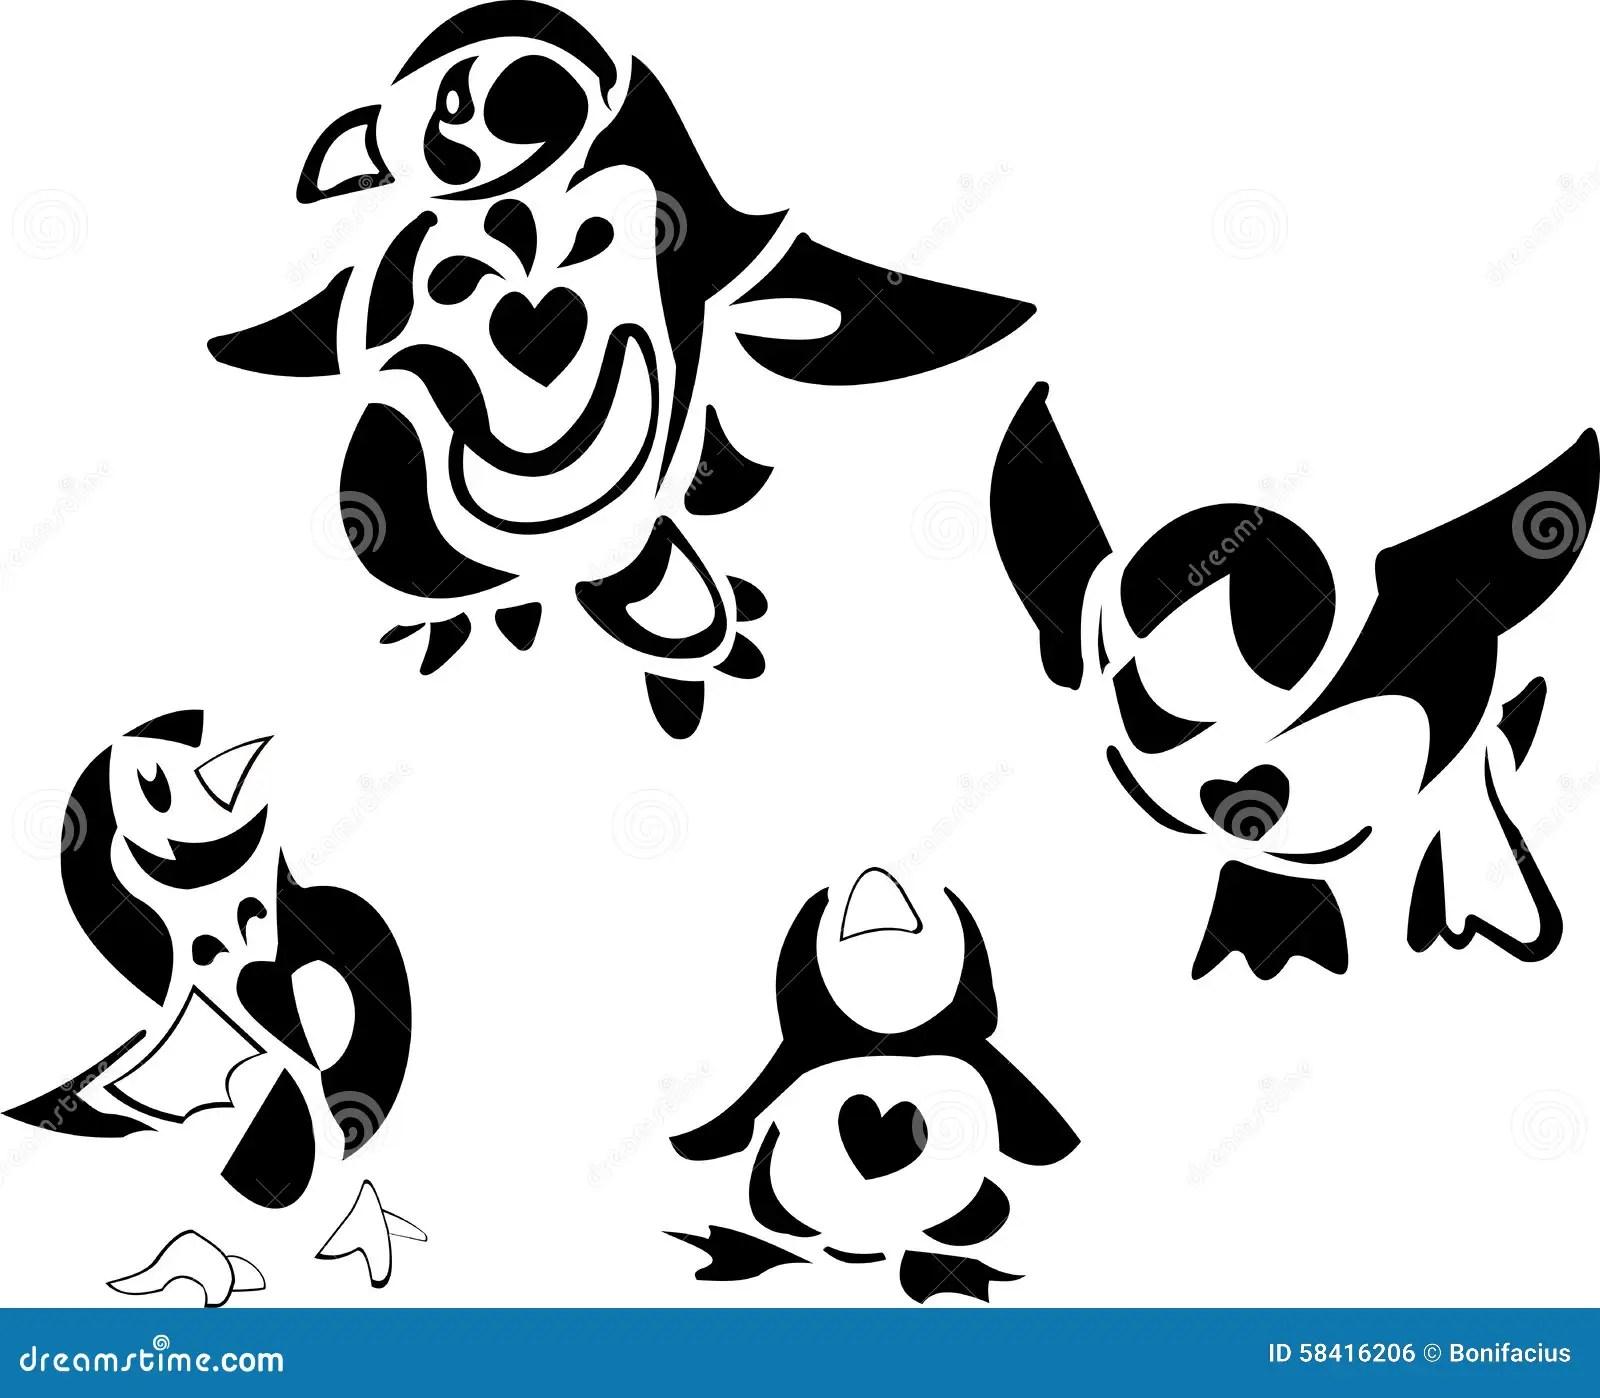 Penguin Family Cartoon Stock Vector Illustration Of